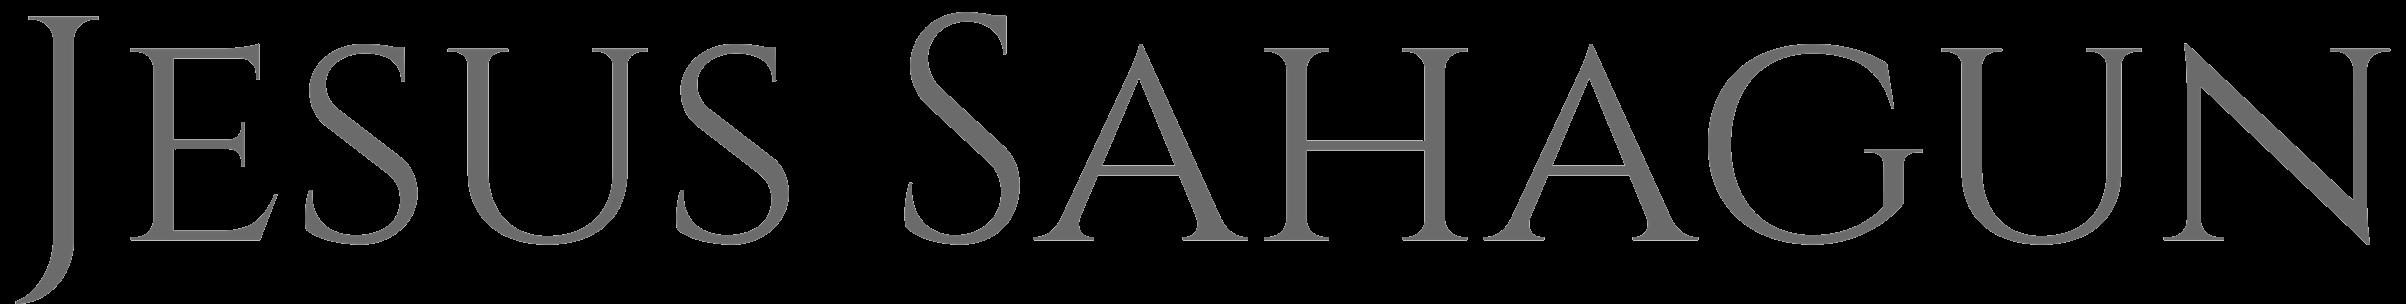 Jesus-Sahagun-Font-Face-Logo-Text-ryanalvarado